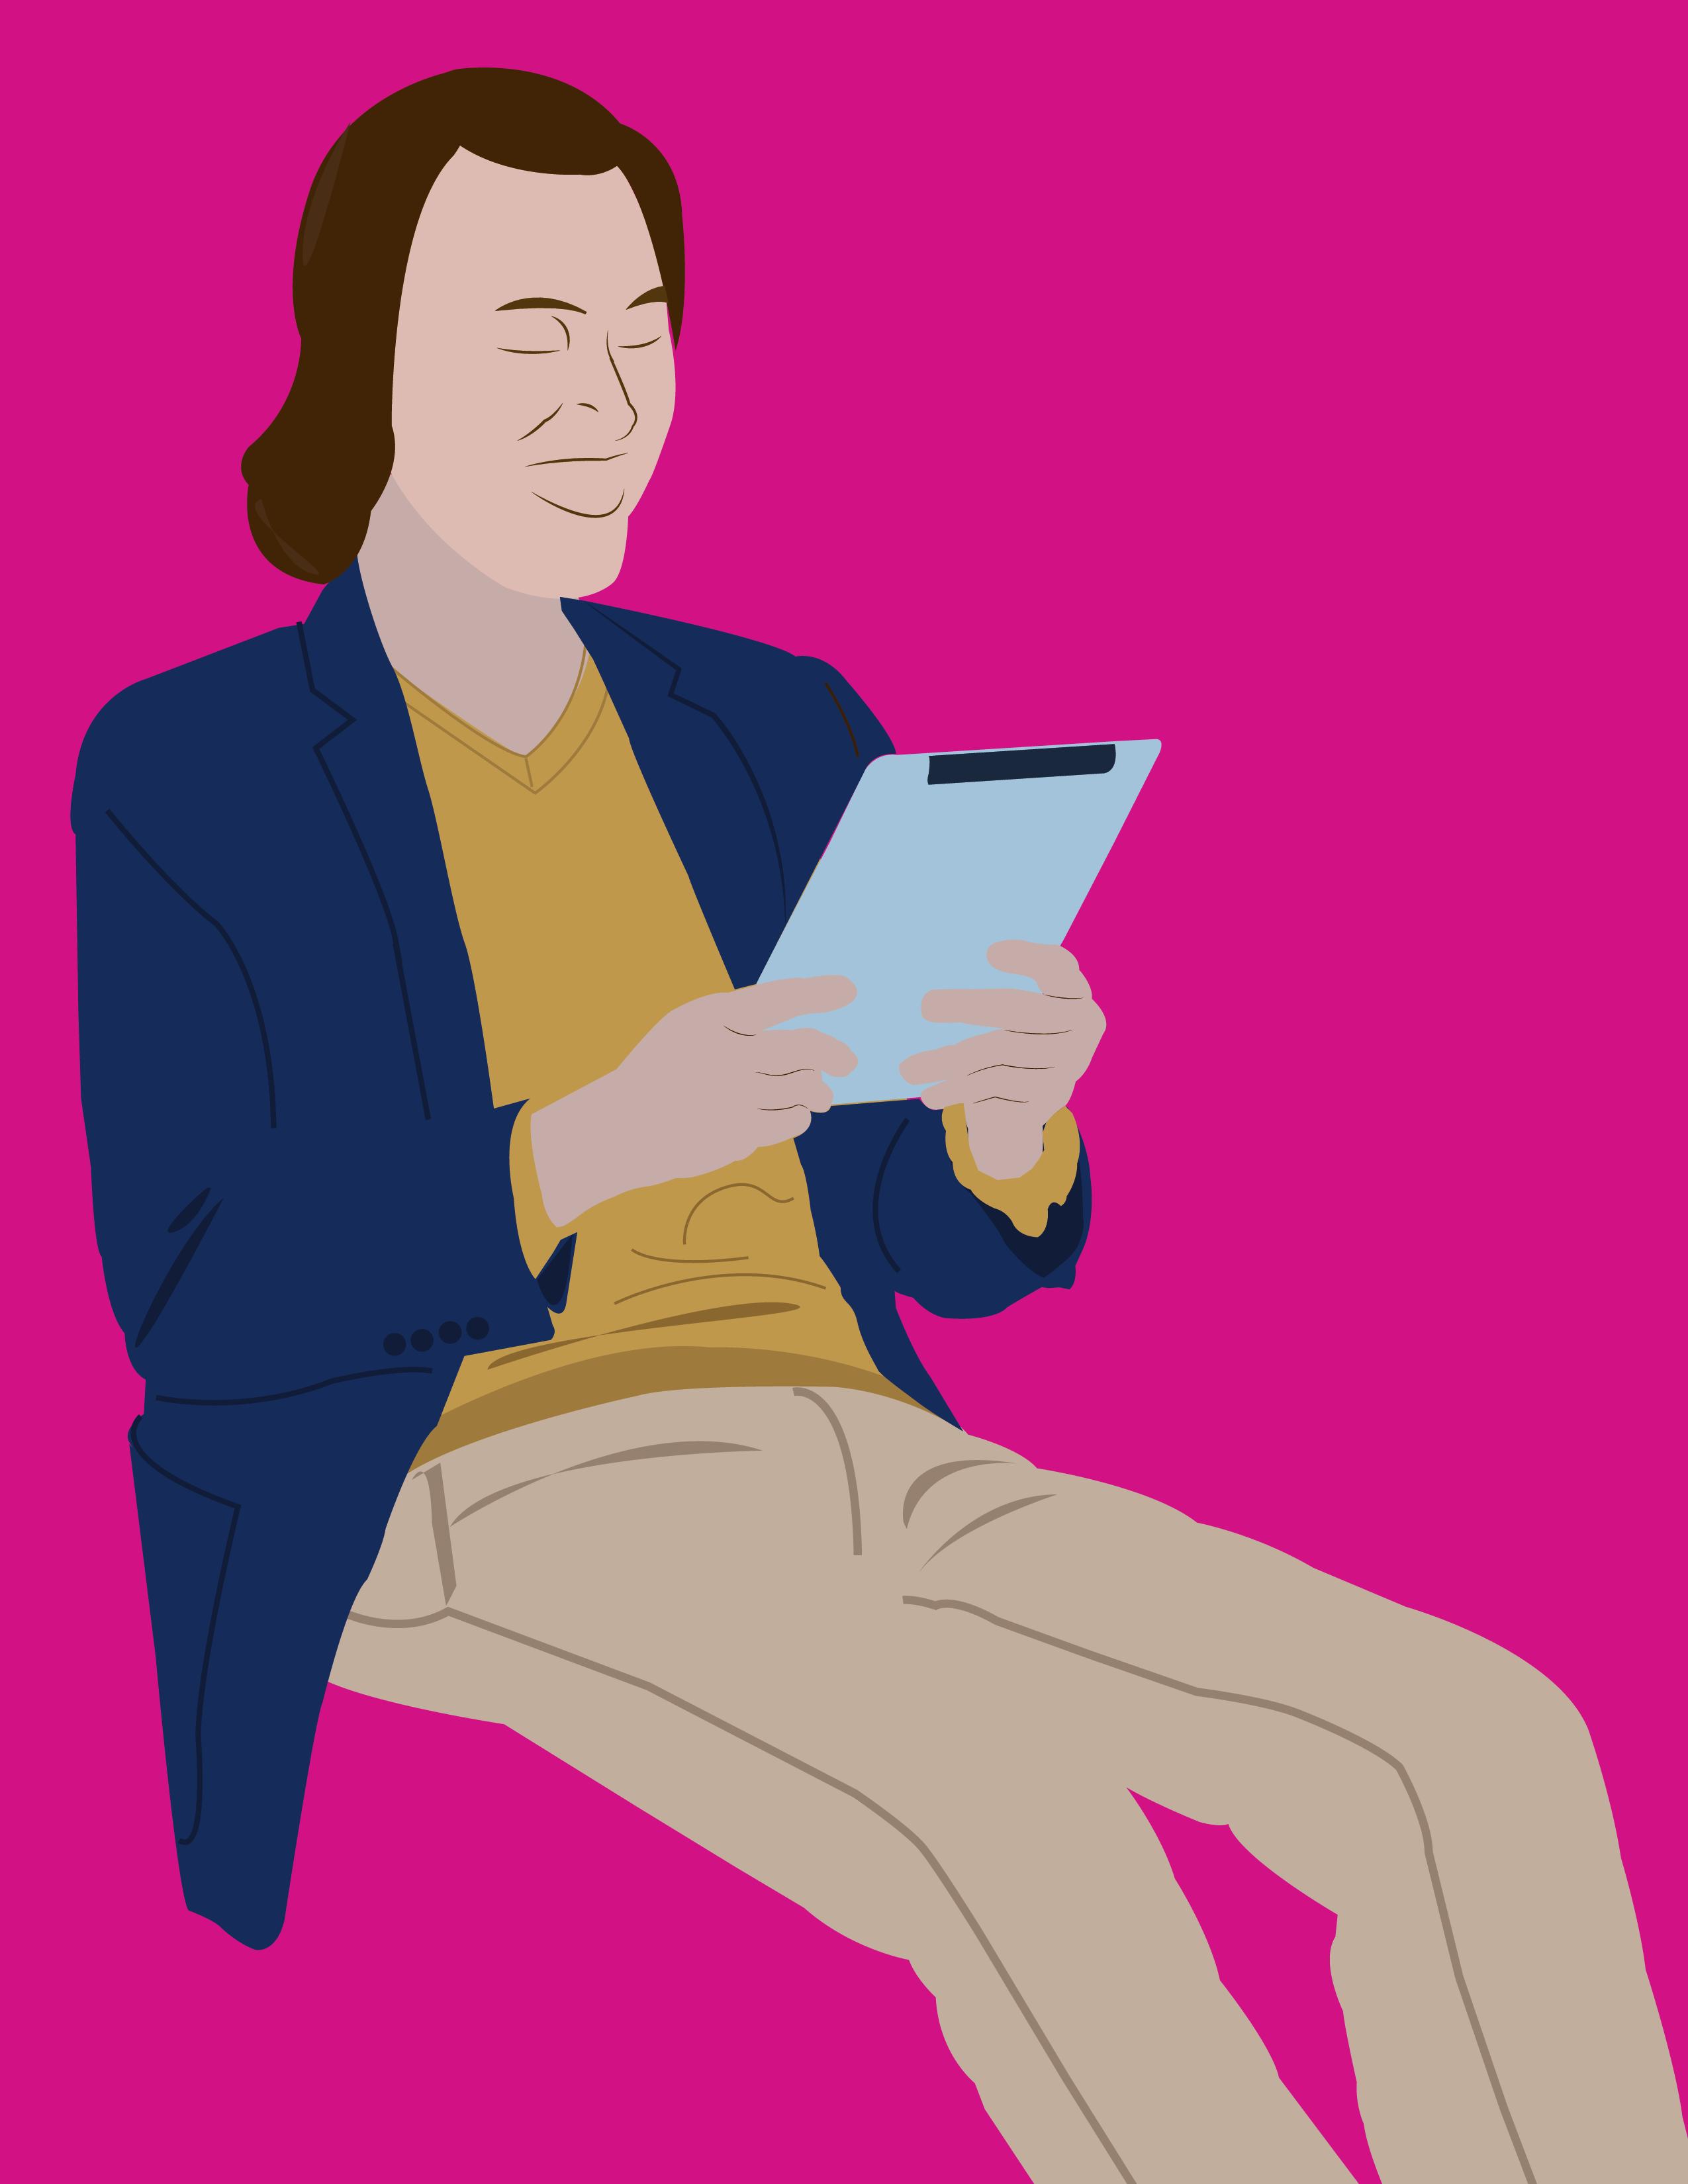 I will design a flat character illustration